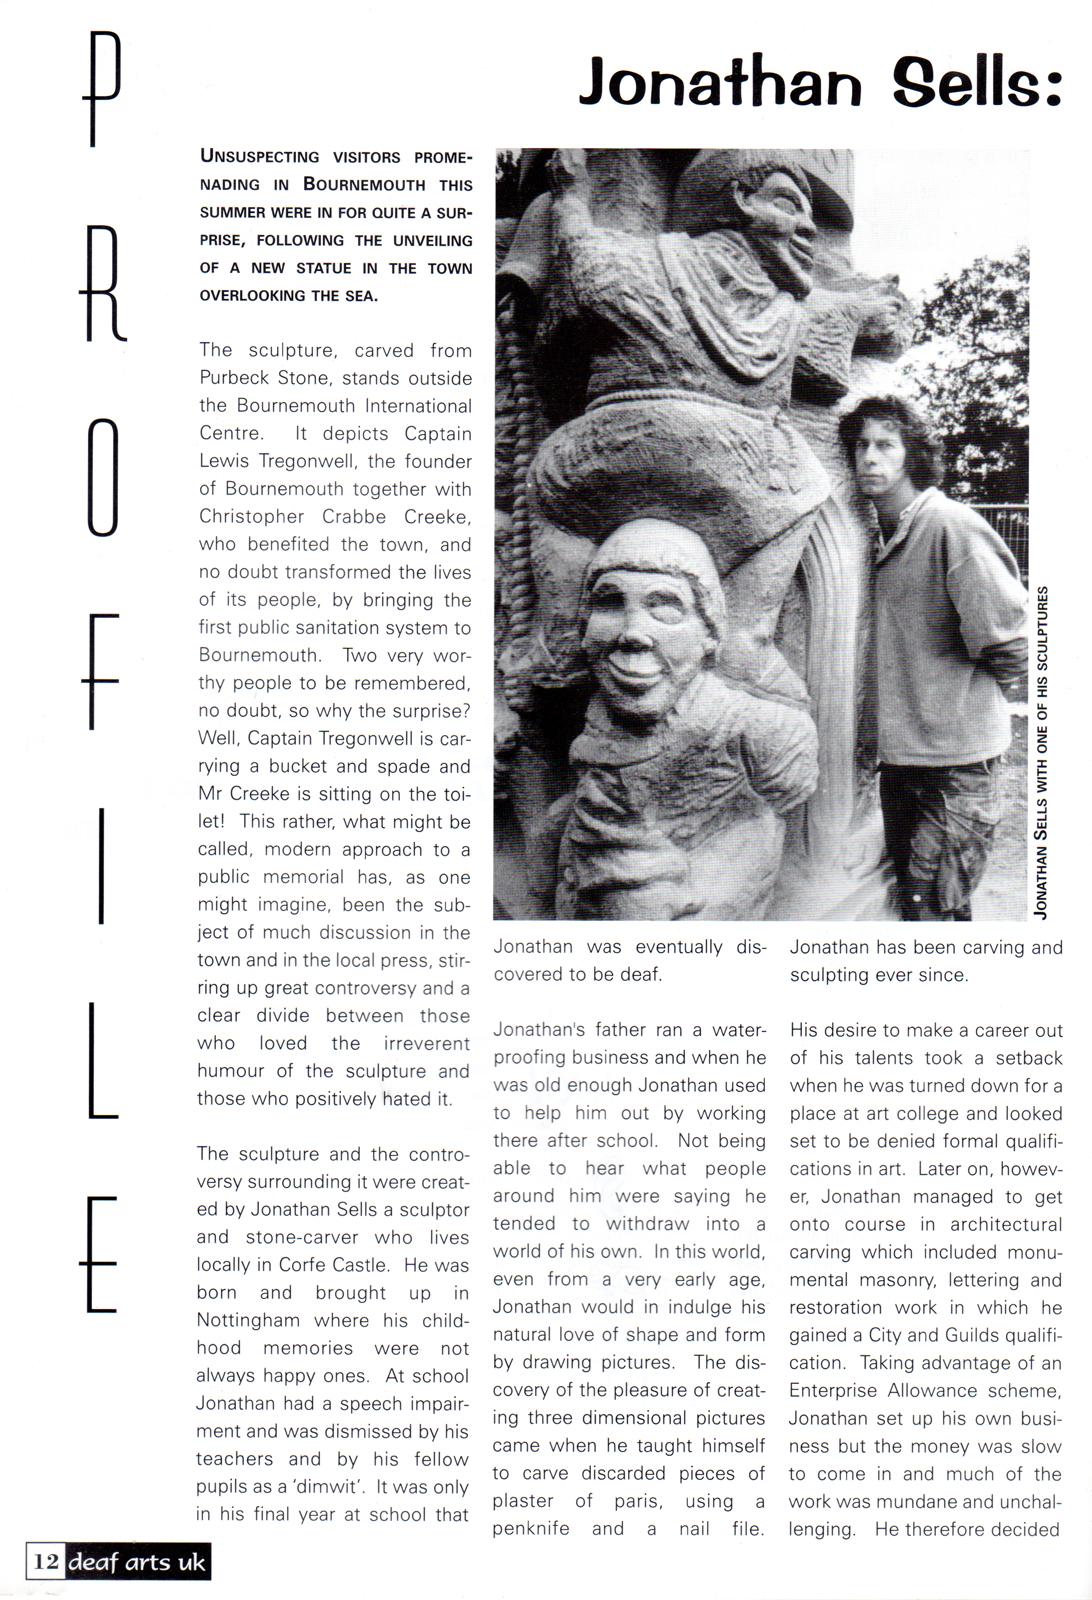 Deaf Arts UK - profile of sculptor Jonathan Sells